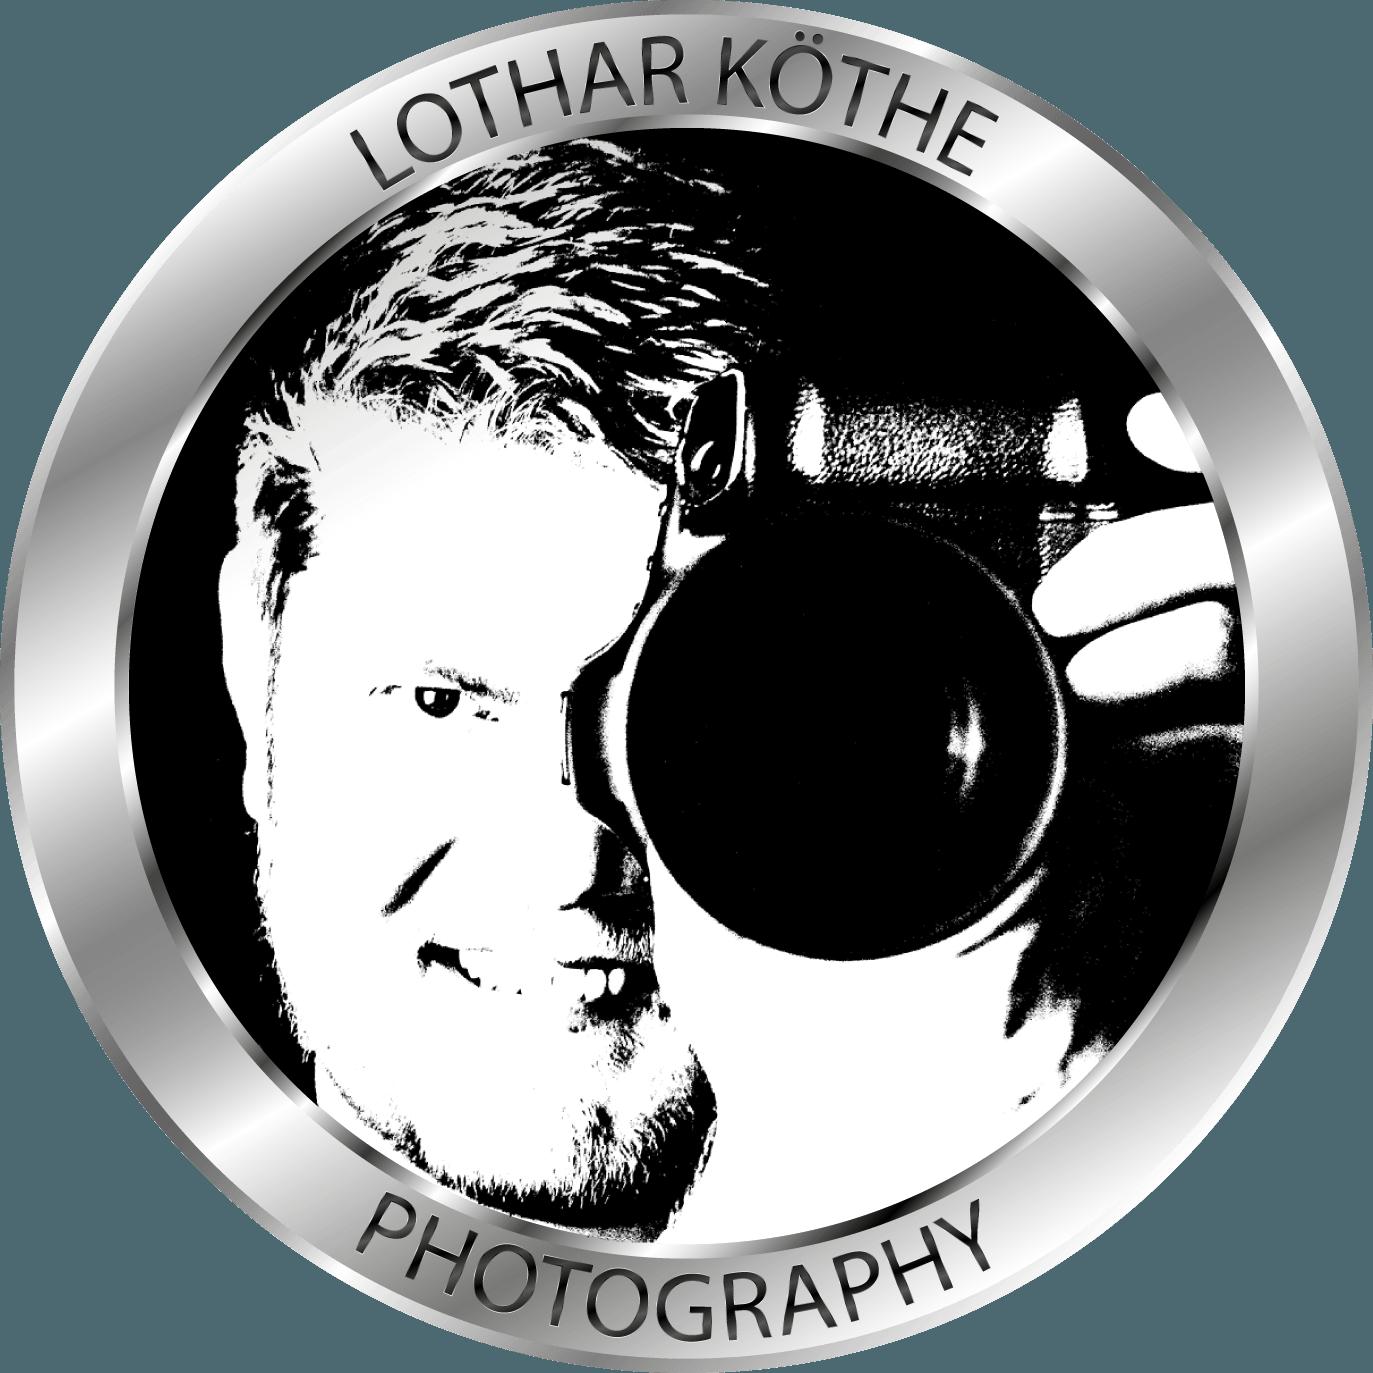 Lothar Köthe Photography